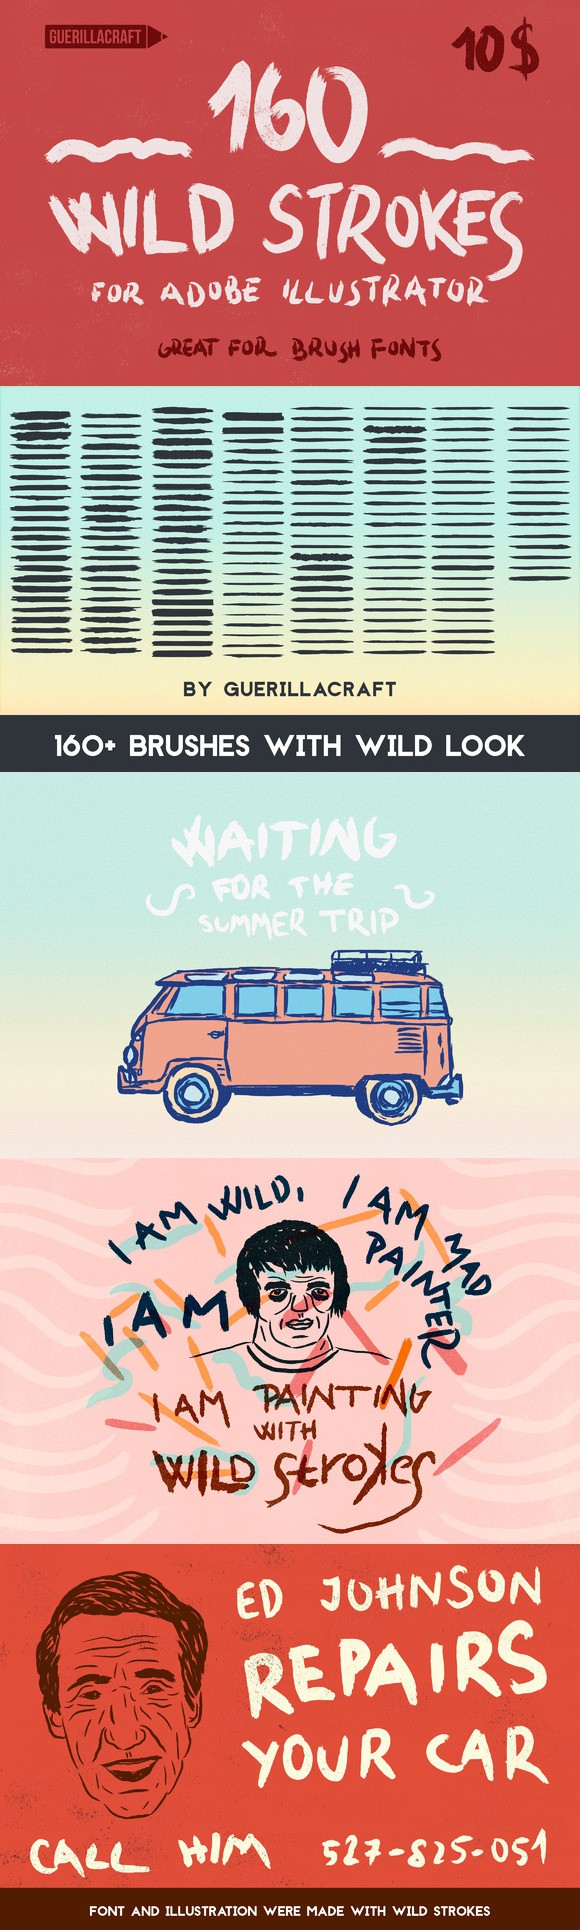 160 Wild Strokes for Illustrator. Photoshop Brushes. $10.00